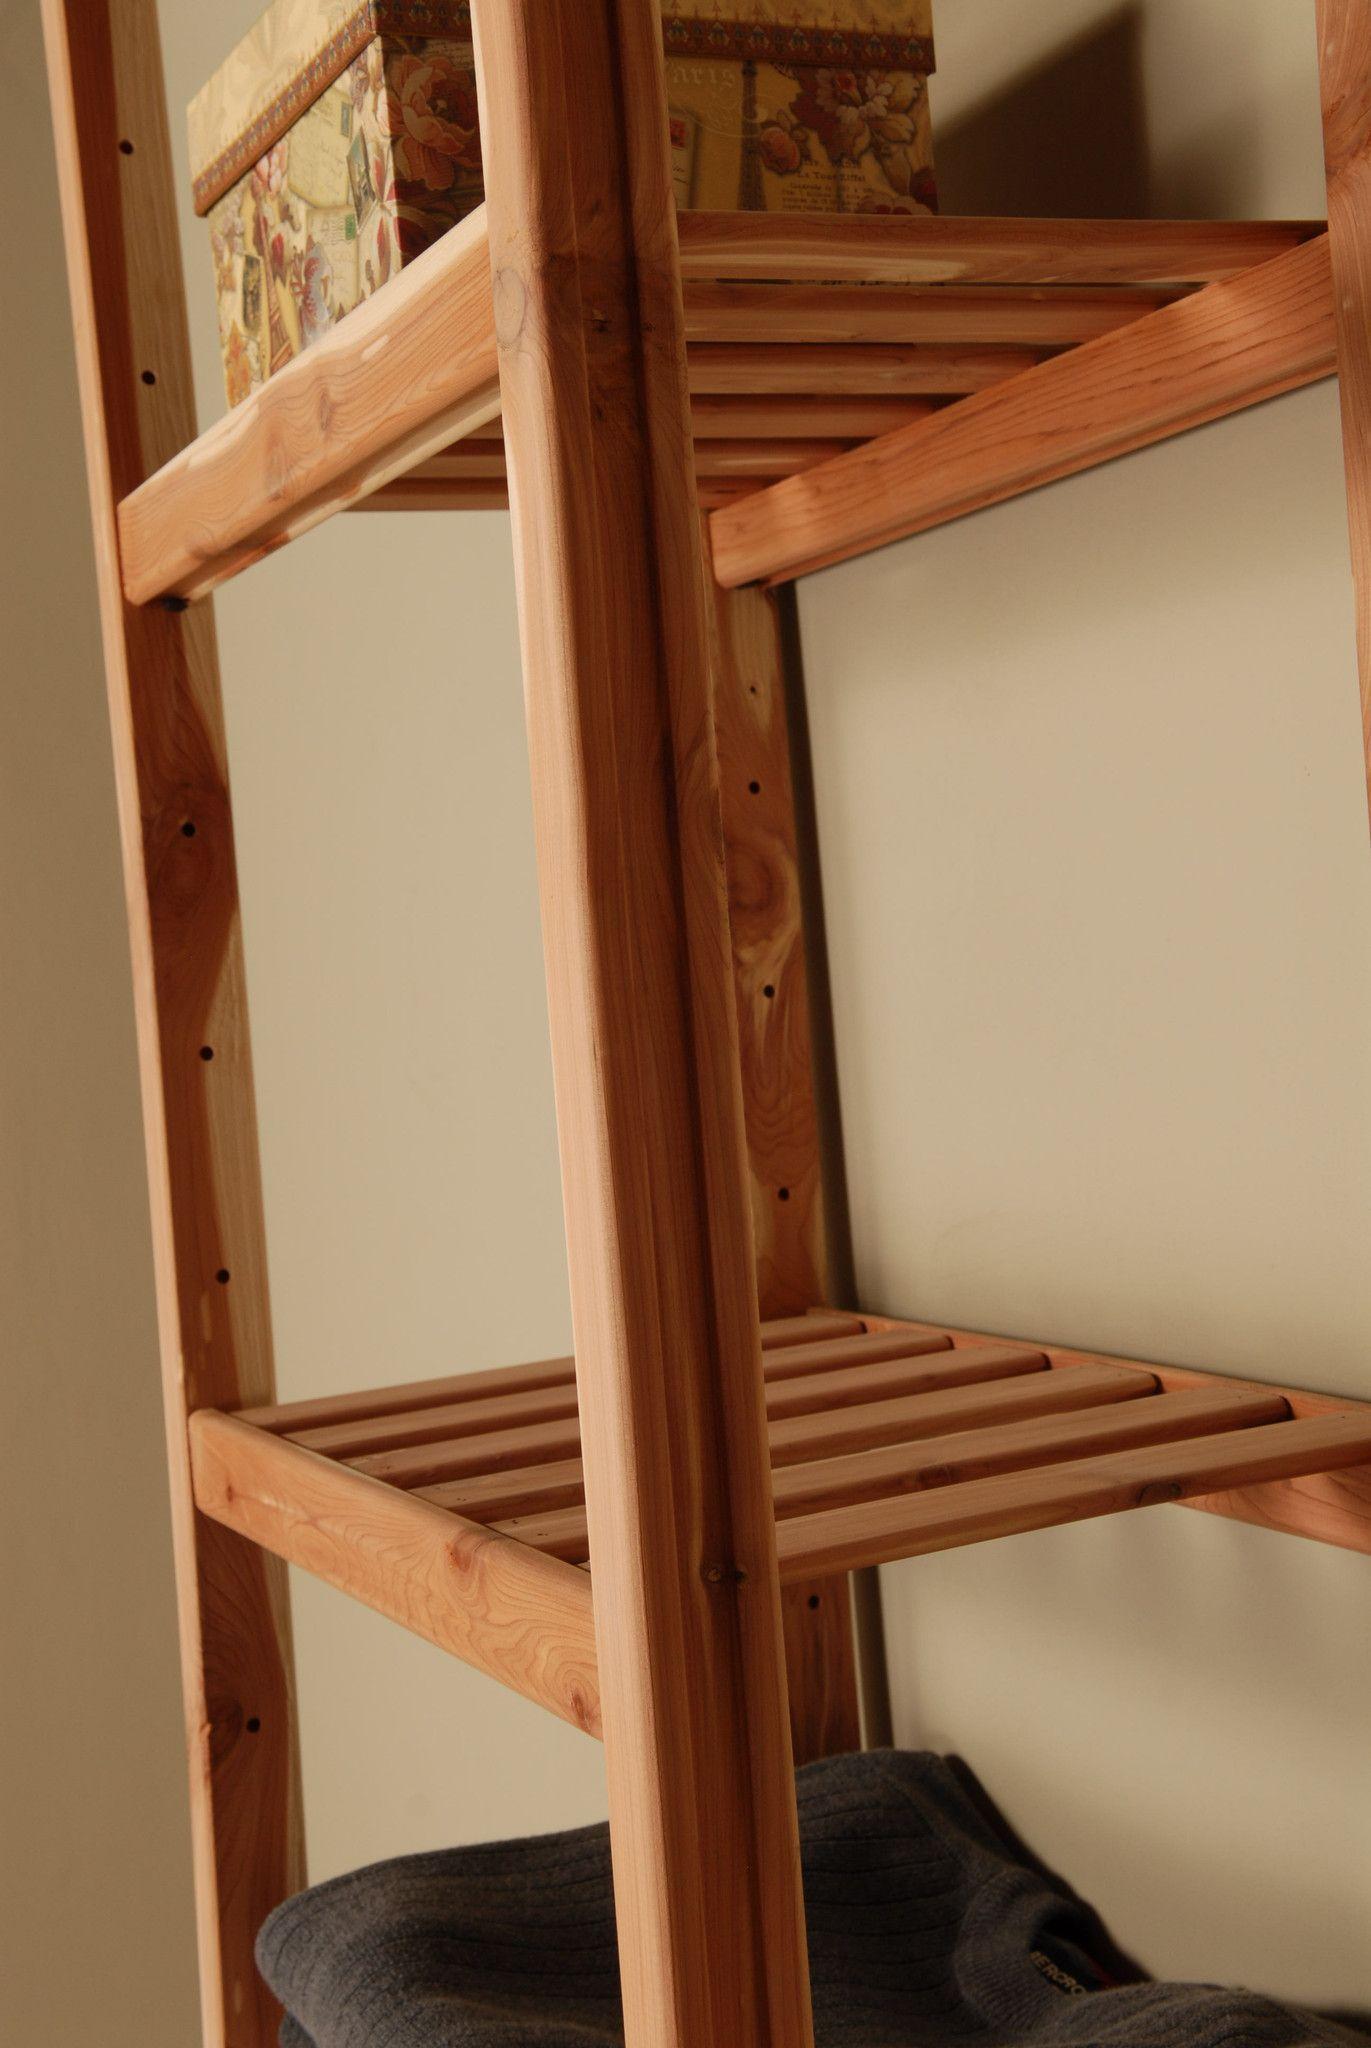 Northern Kentucky Cedar Basic Ventilated Closet Organizer